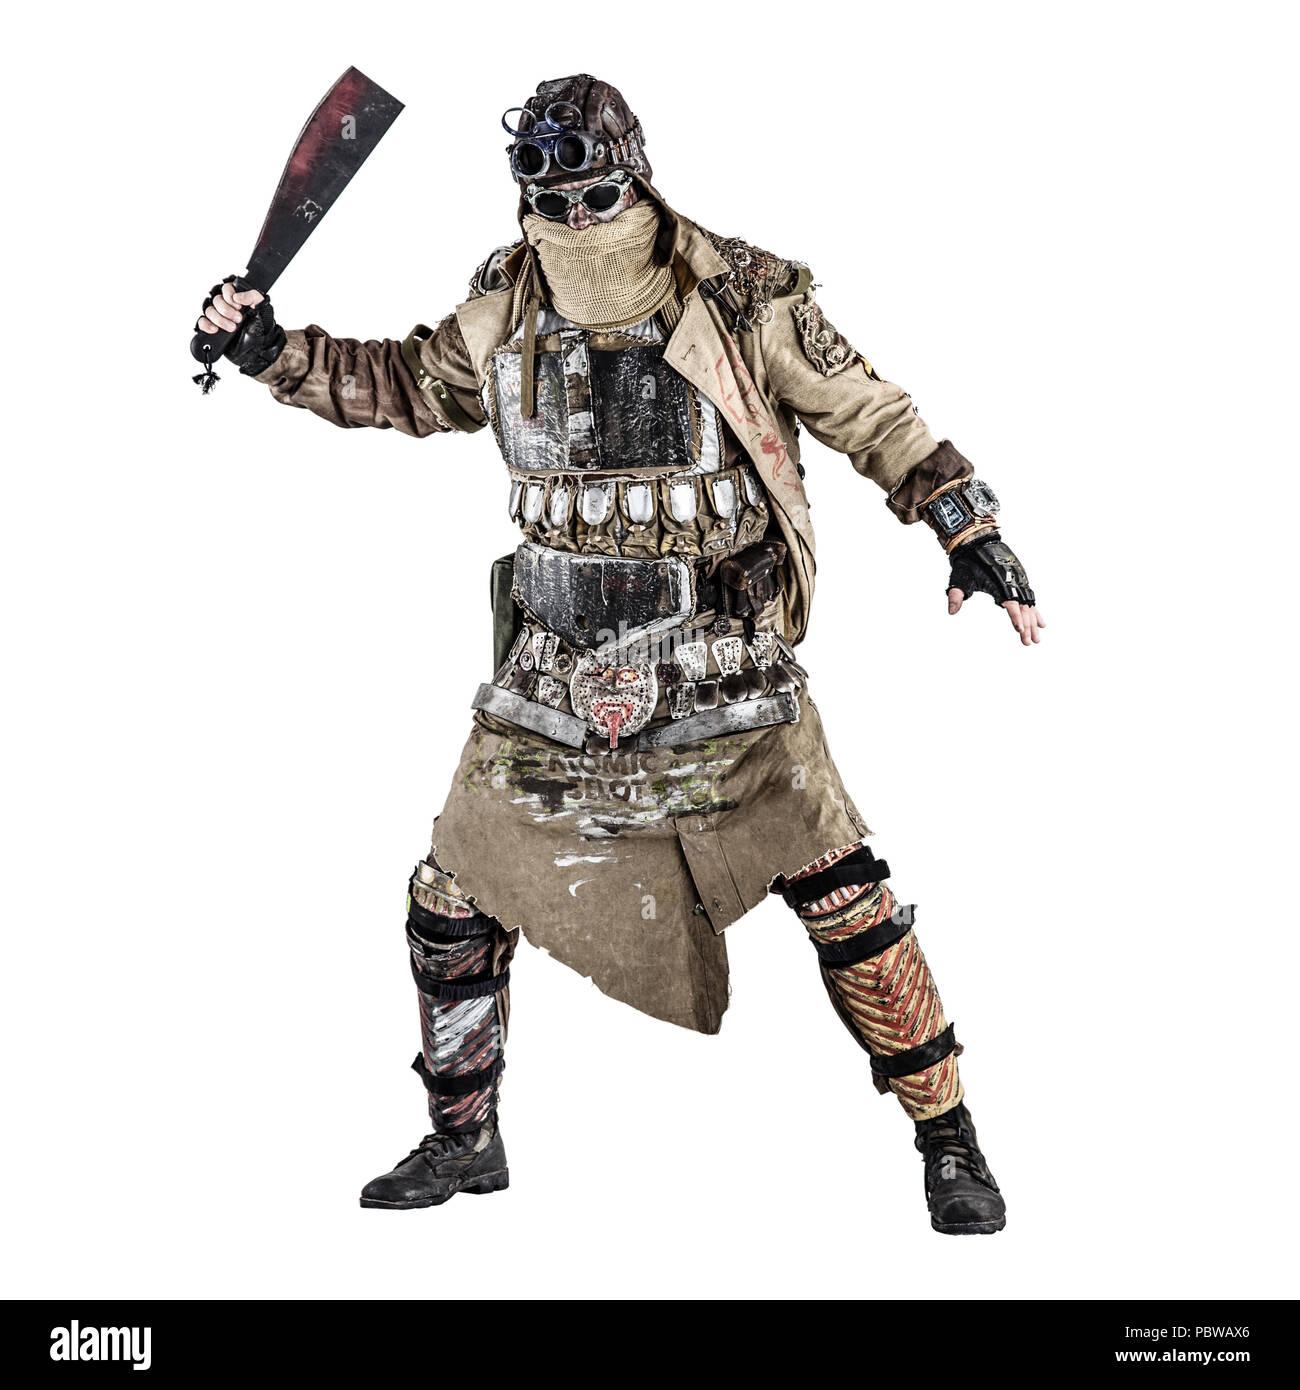 Terrifying post apocalyptic creature with machete - Stock Image